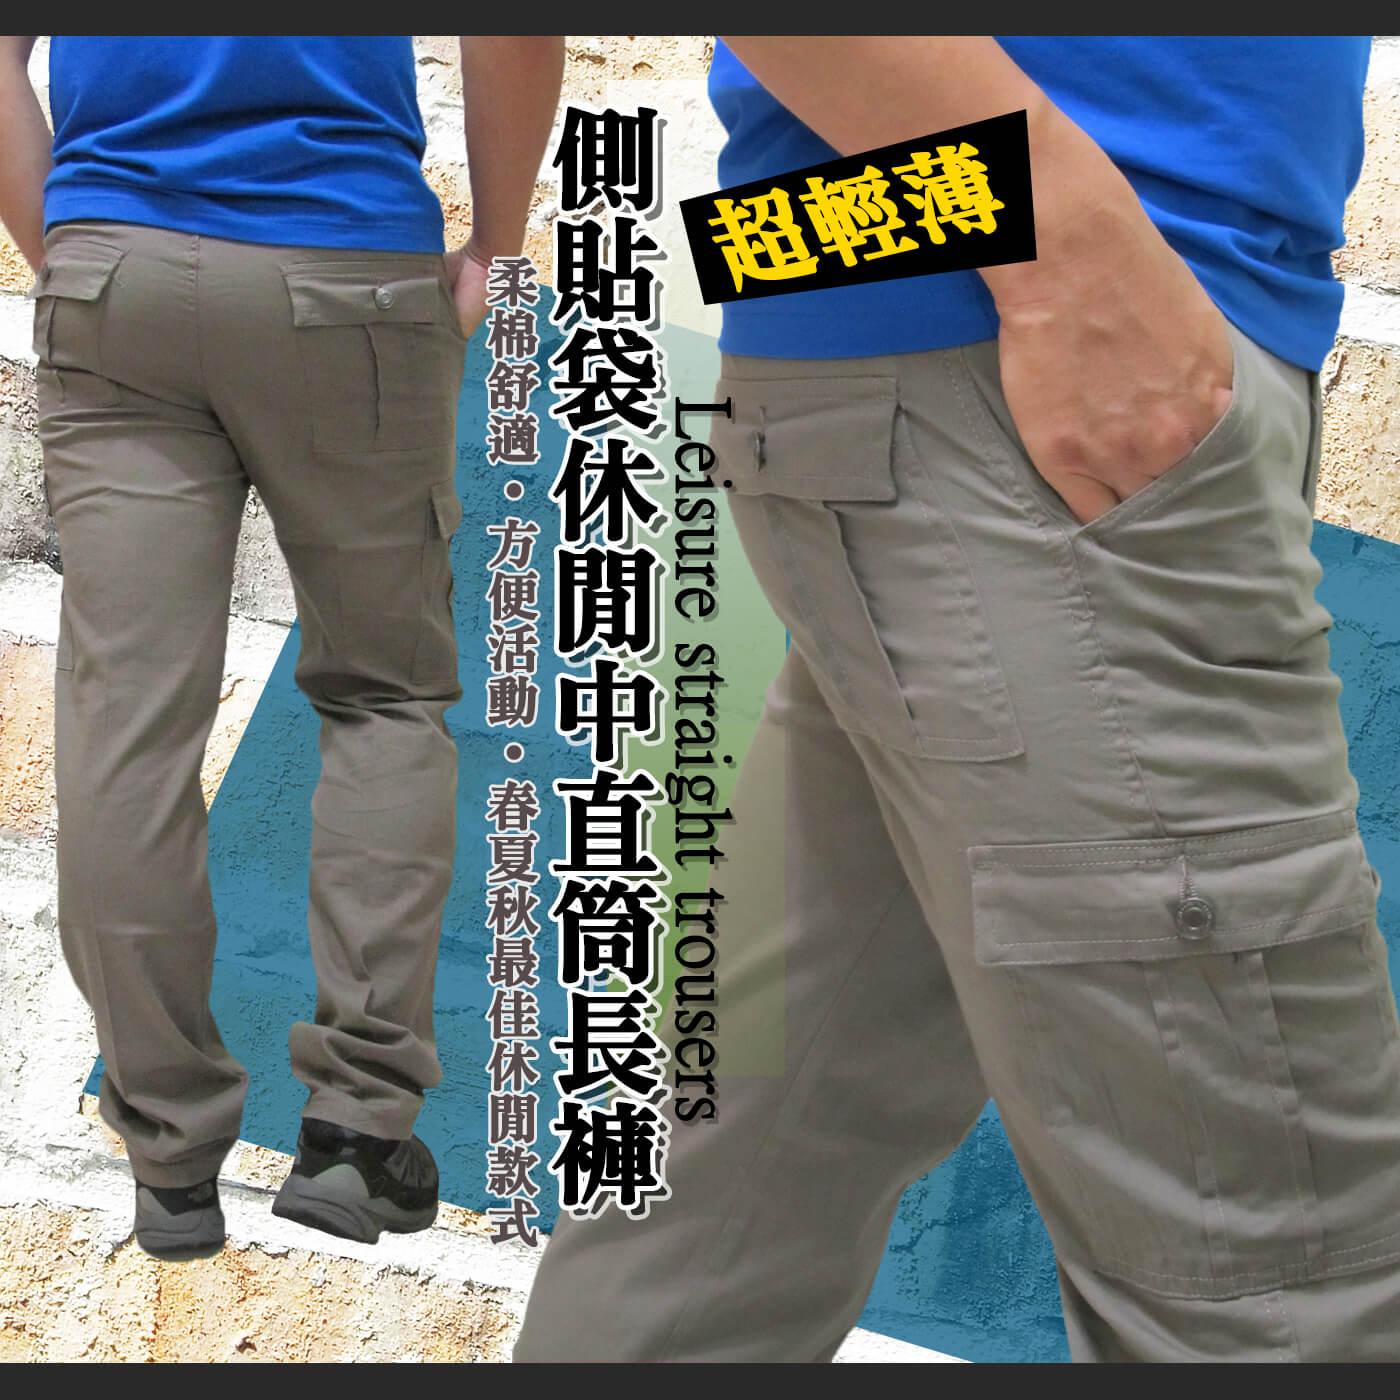 sun-e超輕薄休閒長褲、側貼袋工作褲、多口袋休閒長褲、伸縮中直筒休閒長褲(307-7006-16)卡其 腰圍:M L XL LL 3L 4L 5L(28~41英吋) 0